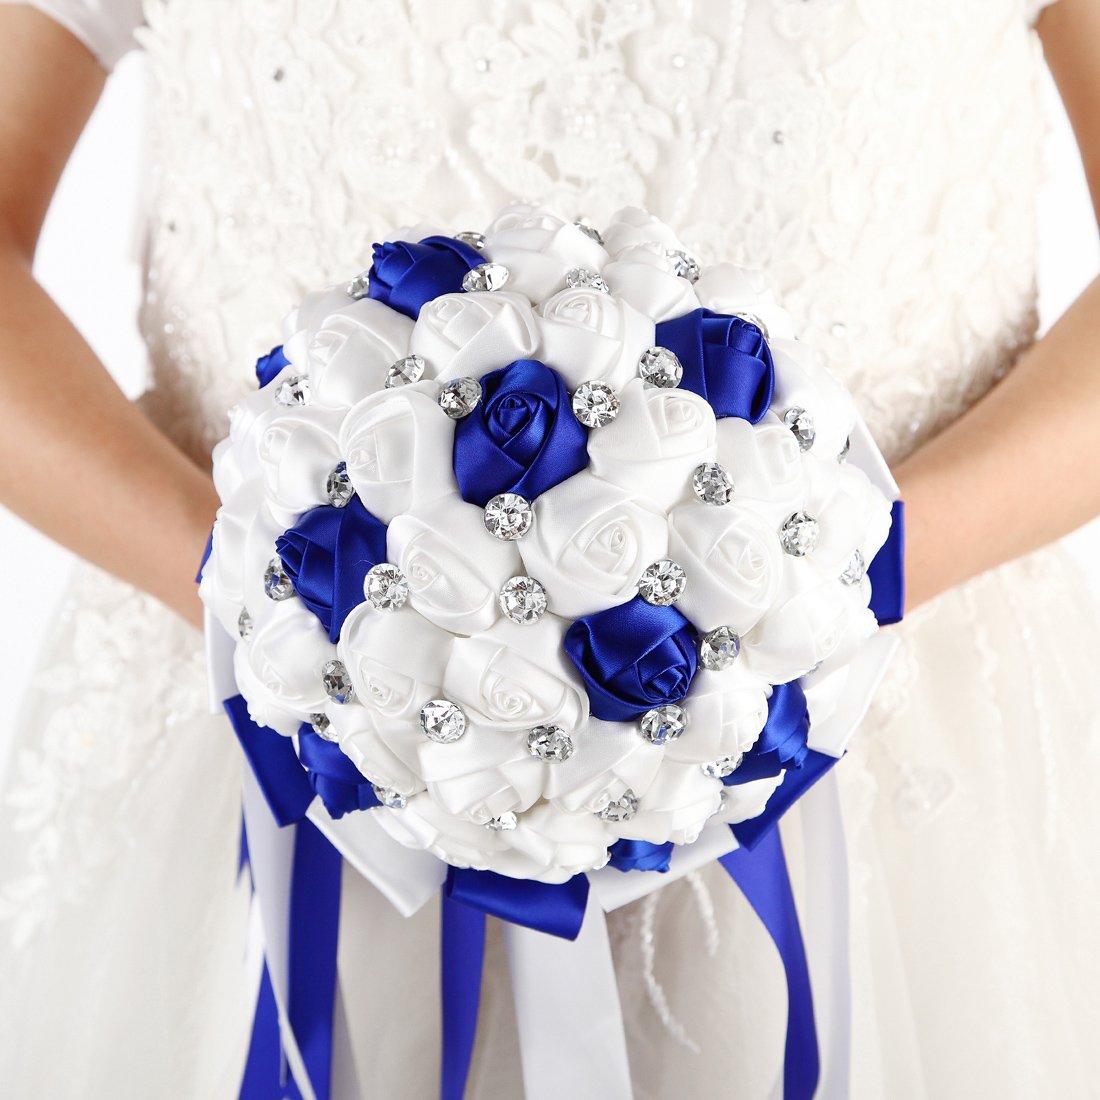 FAYBOX Crystal Satin Rose Bridal Bridesmaid Bouquets Wedding Flower Decor Royal Blue 2